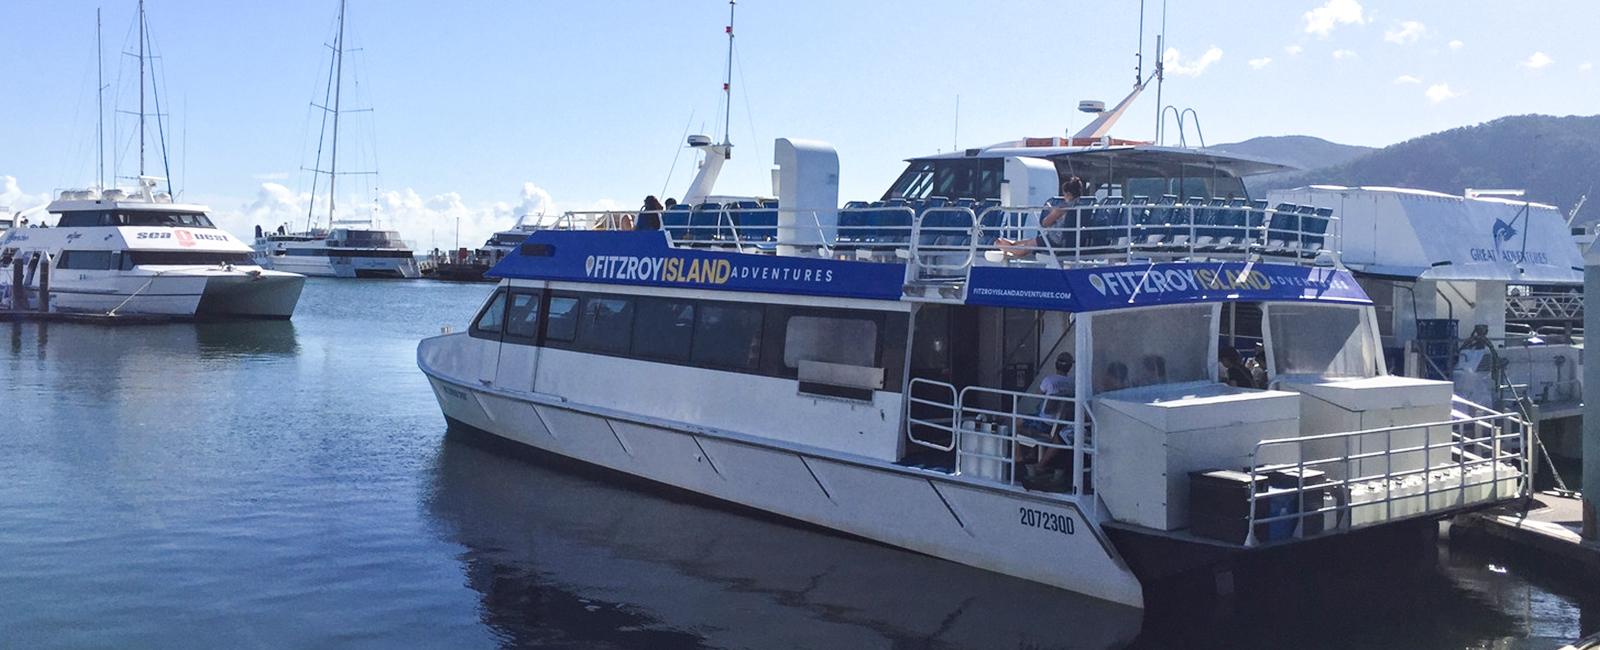 Fitzroy Island Boat